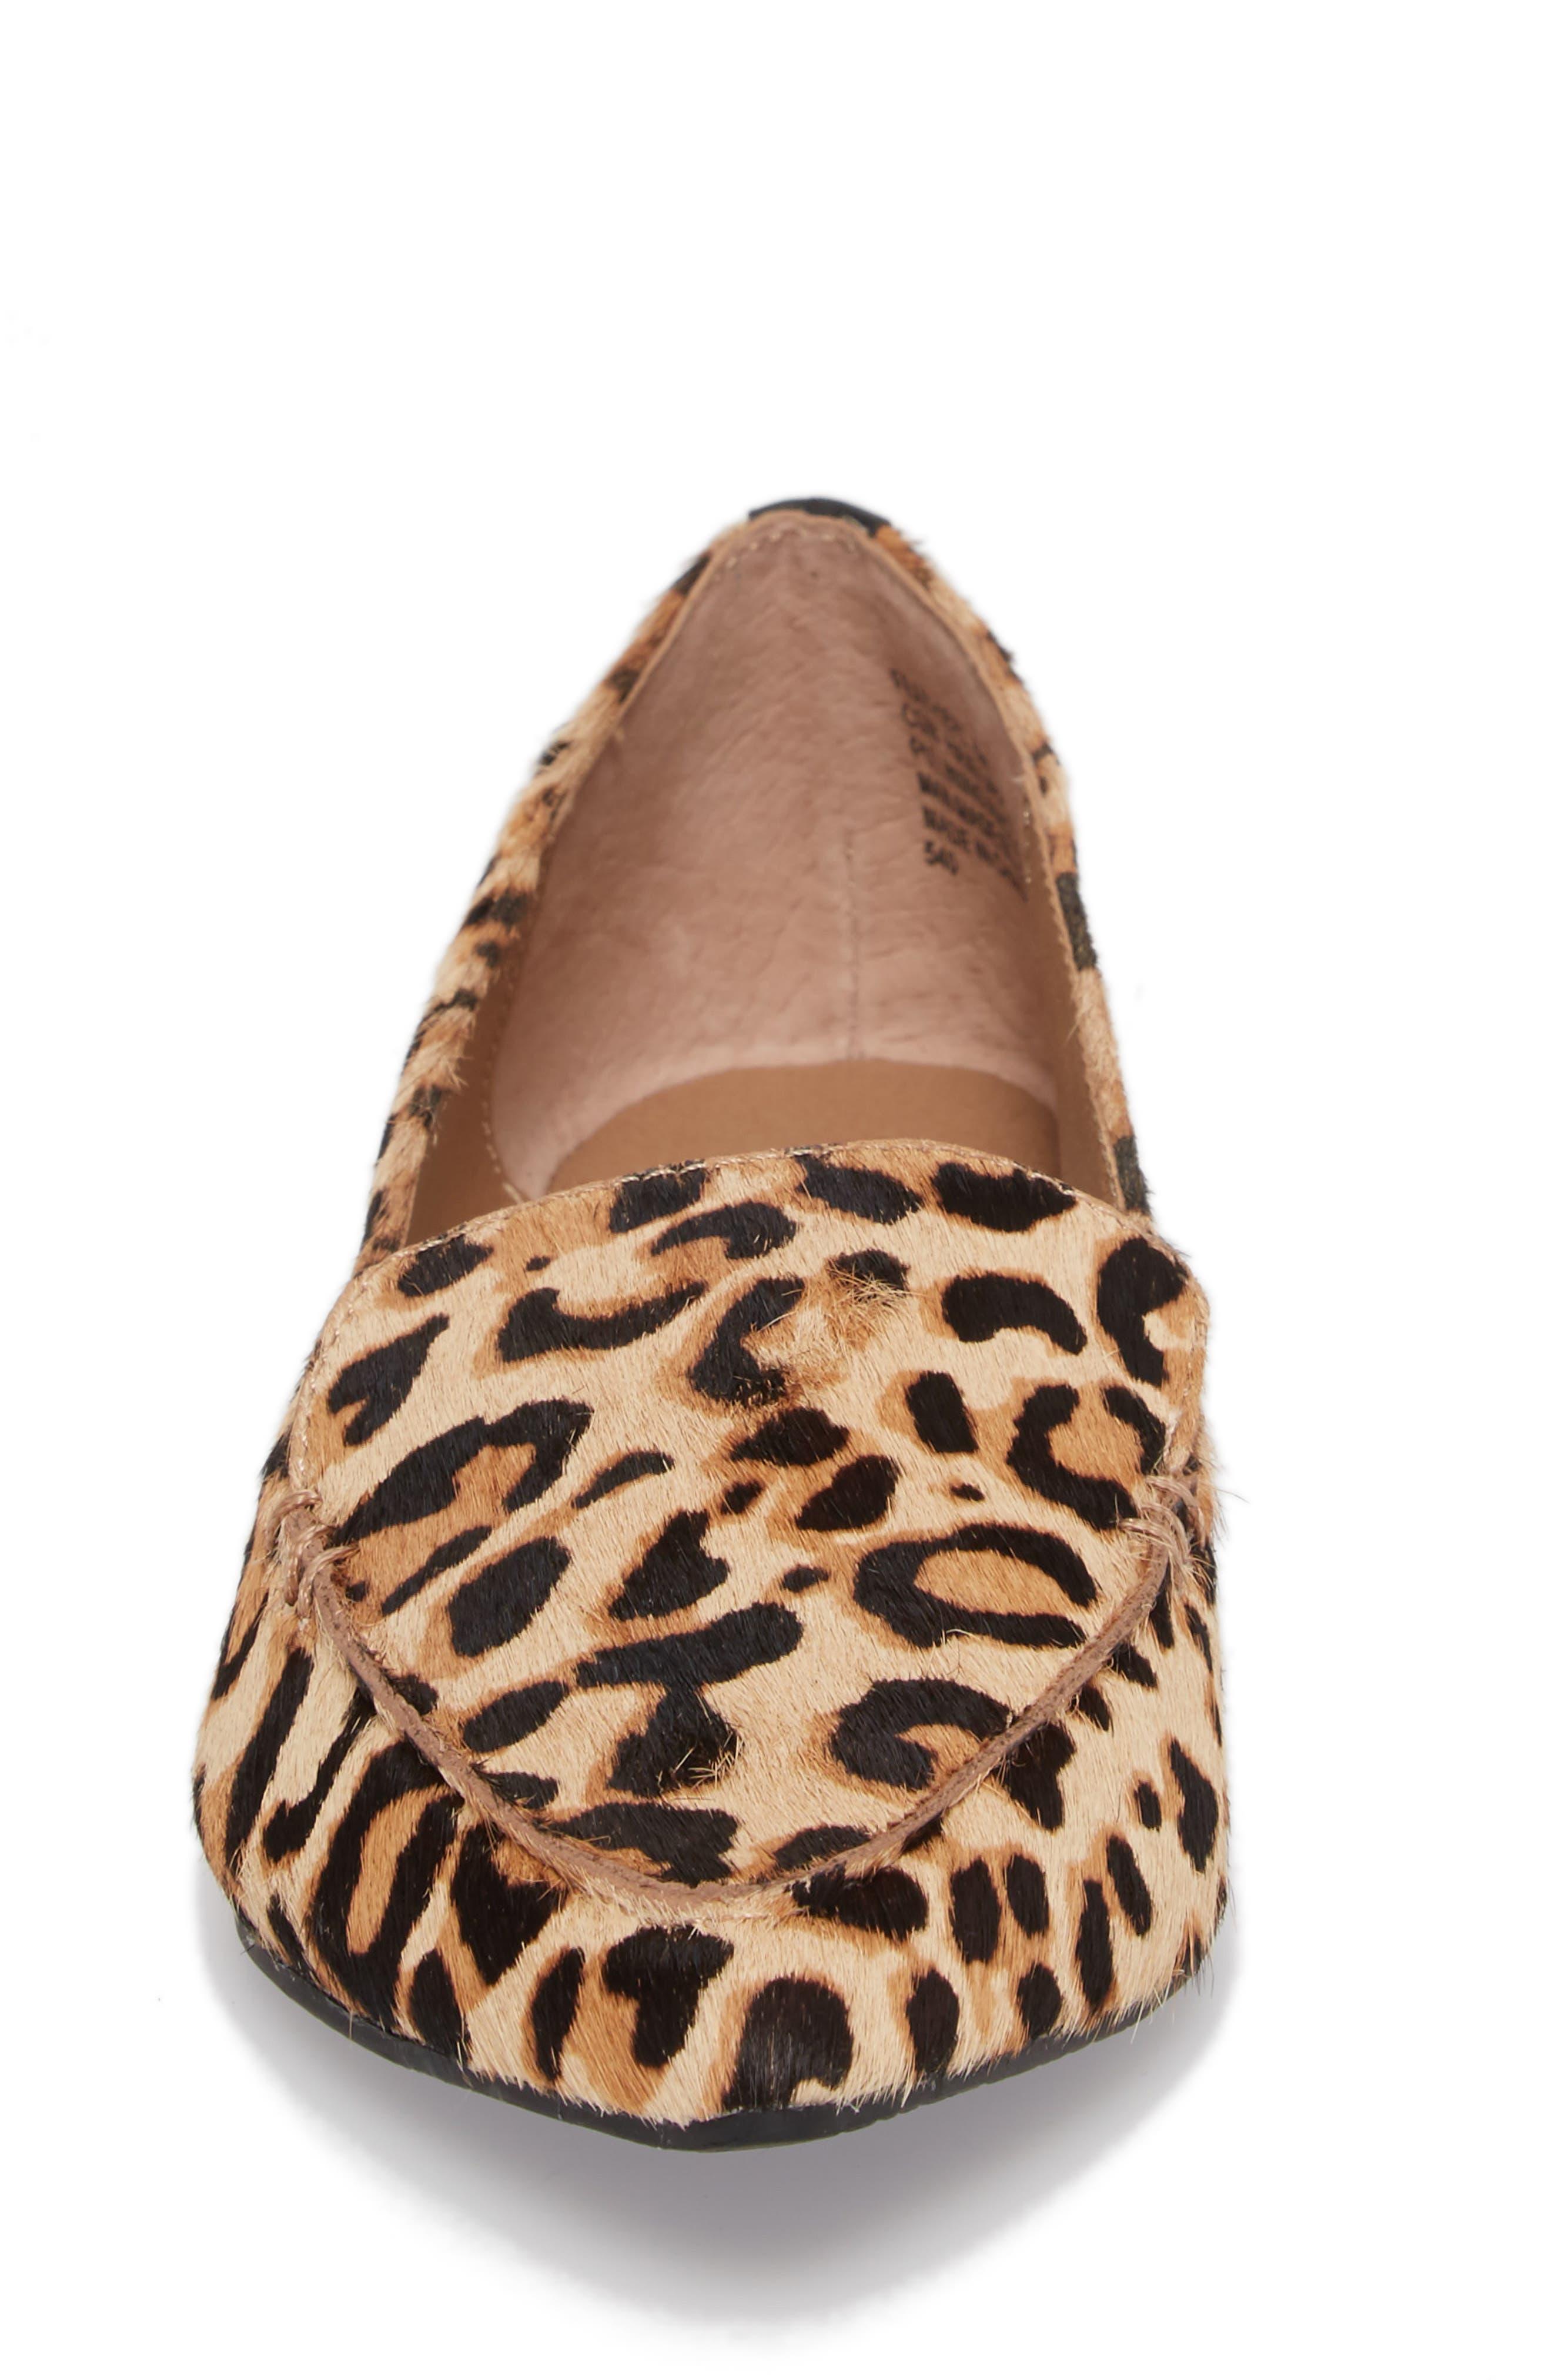 STEVE MADDEN, Feather-L Genuine Calf Hair Loafer Flat, Alternate thumbnail 4, color, LEOPARD